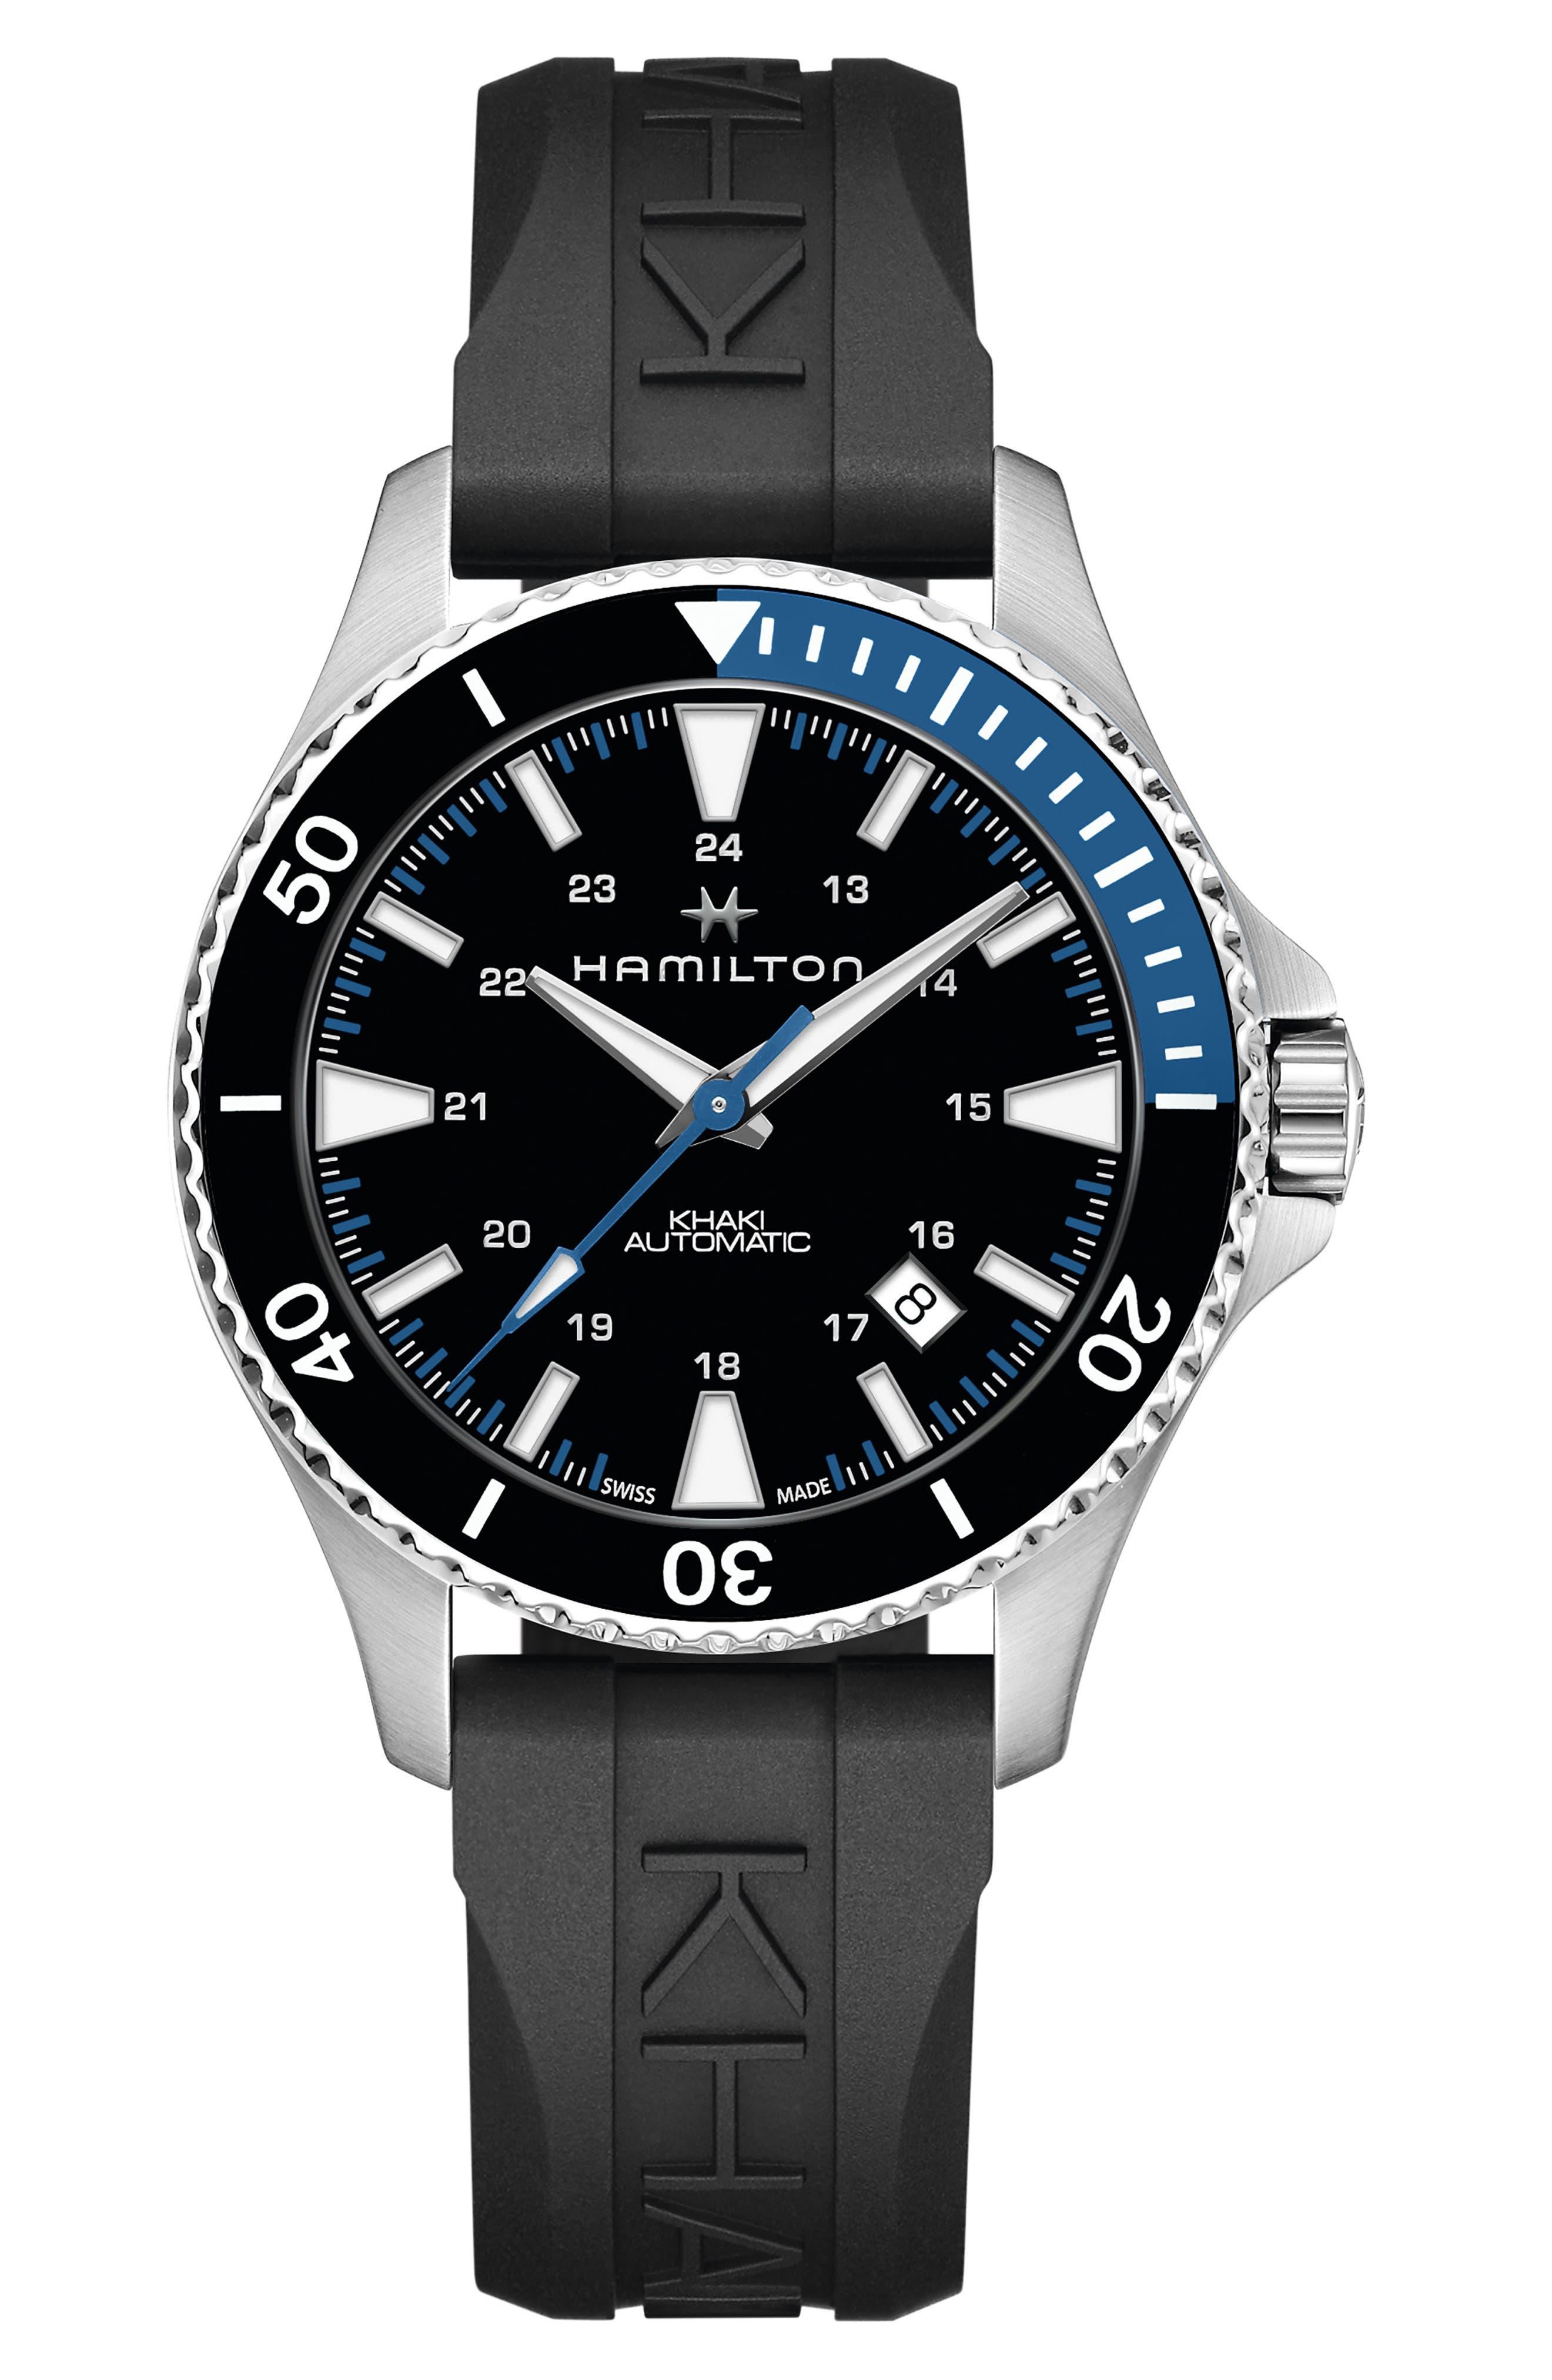 Khaki Navy Automatic Rubber Strap Watch